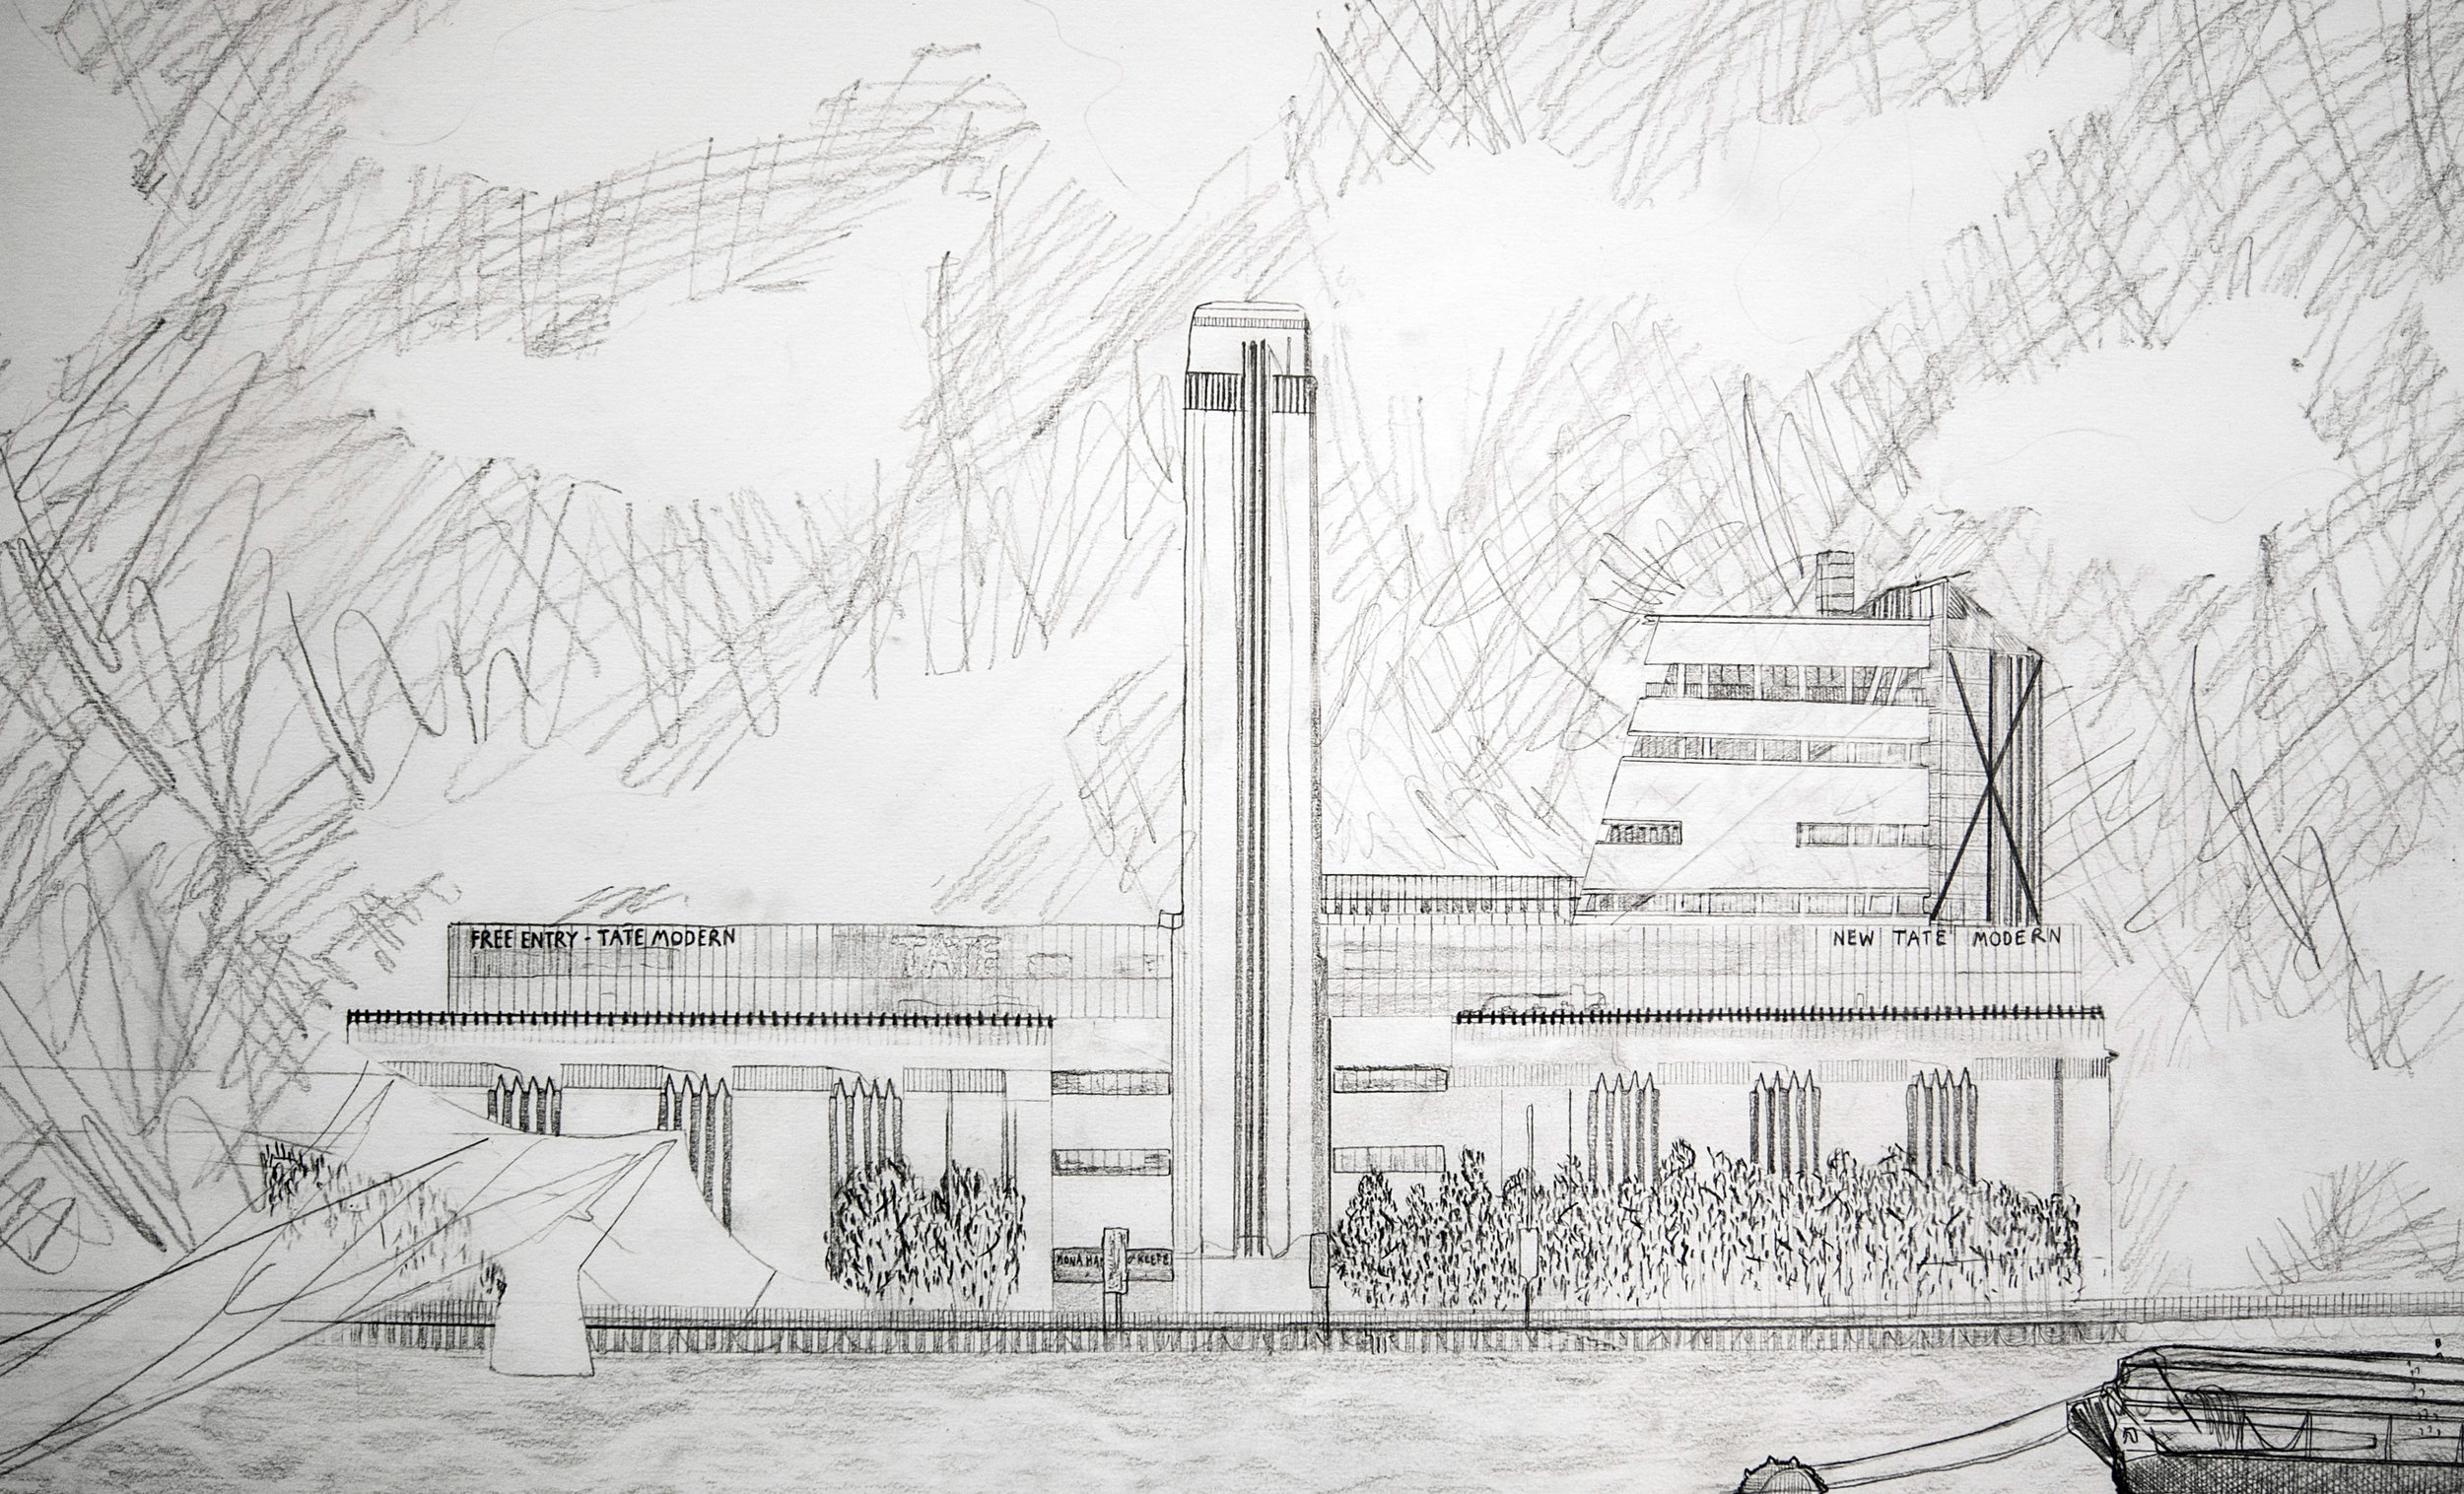 Tate Modern (detail), pencil drawing, 59.4 x 84.1cm